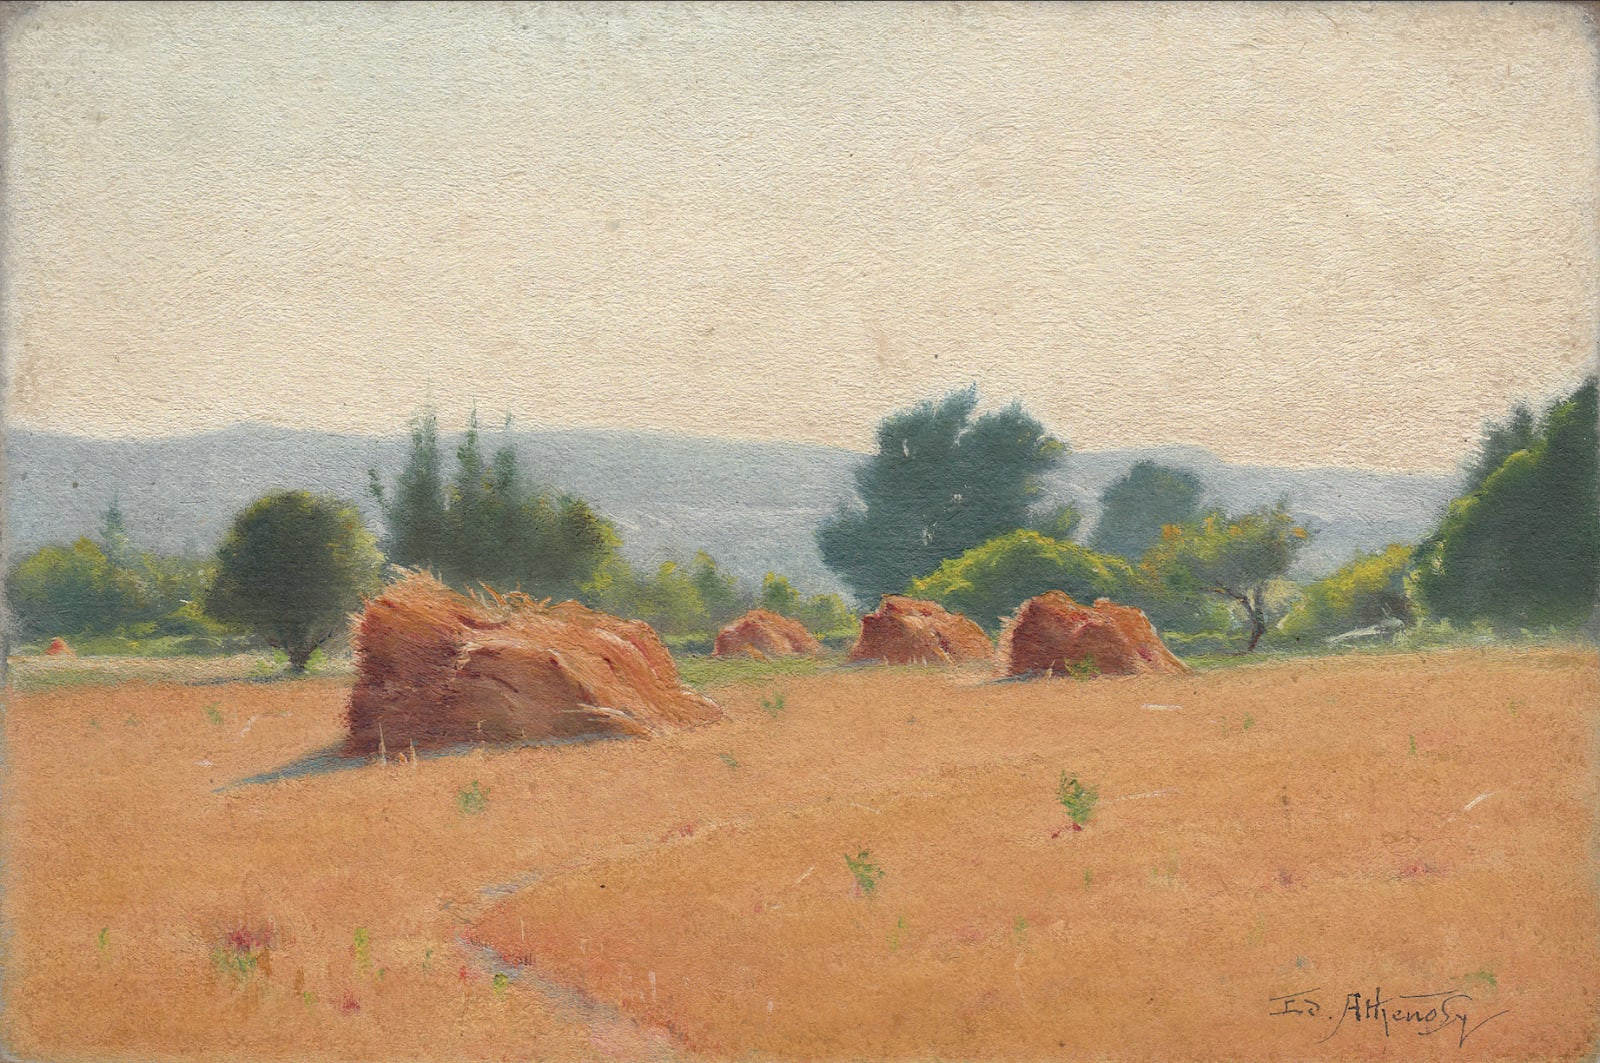 EDOUARD ATHÉNOSY, M-149, c. 1920